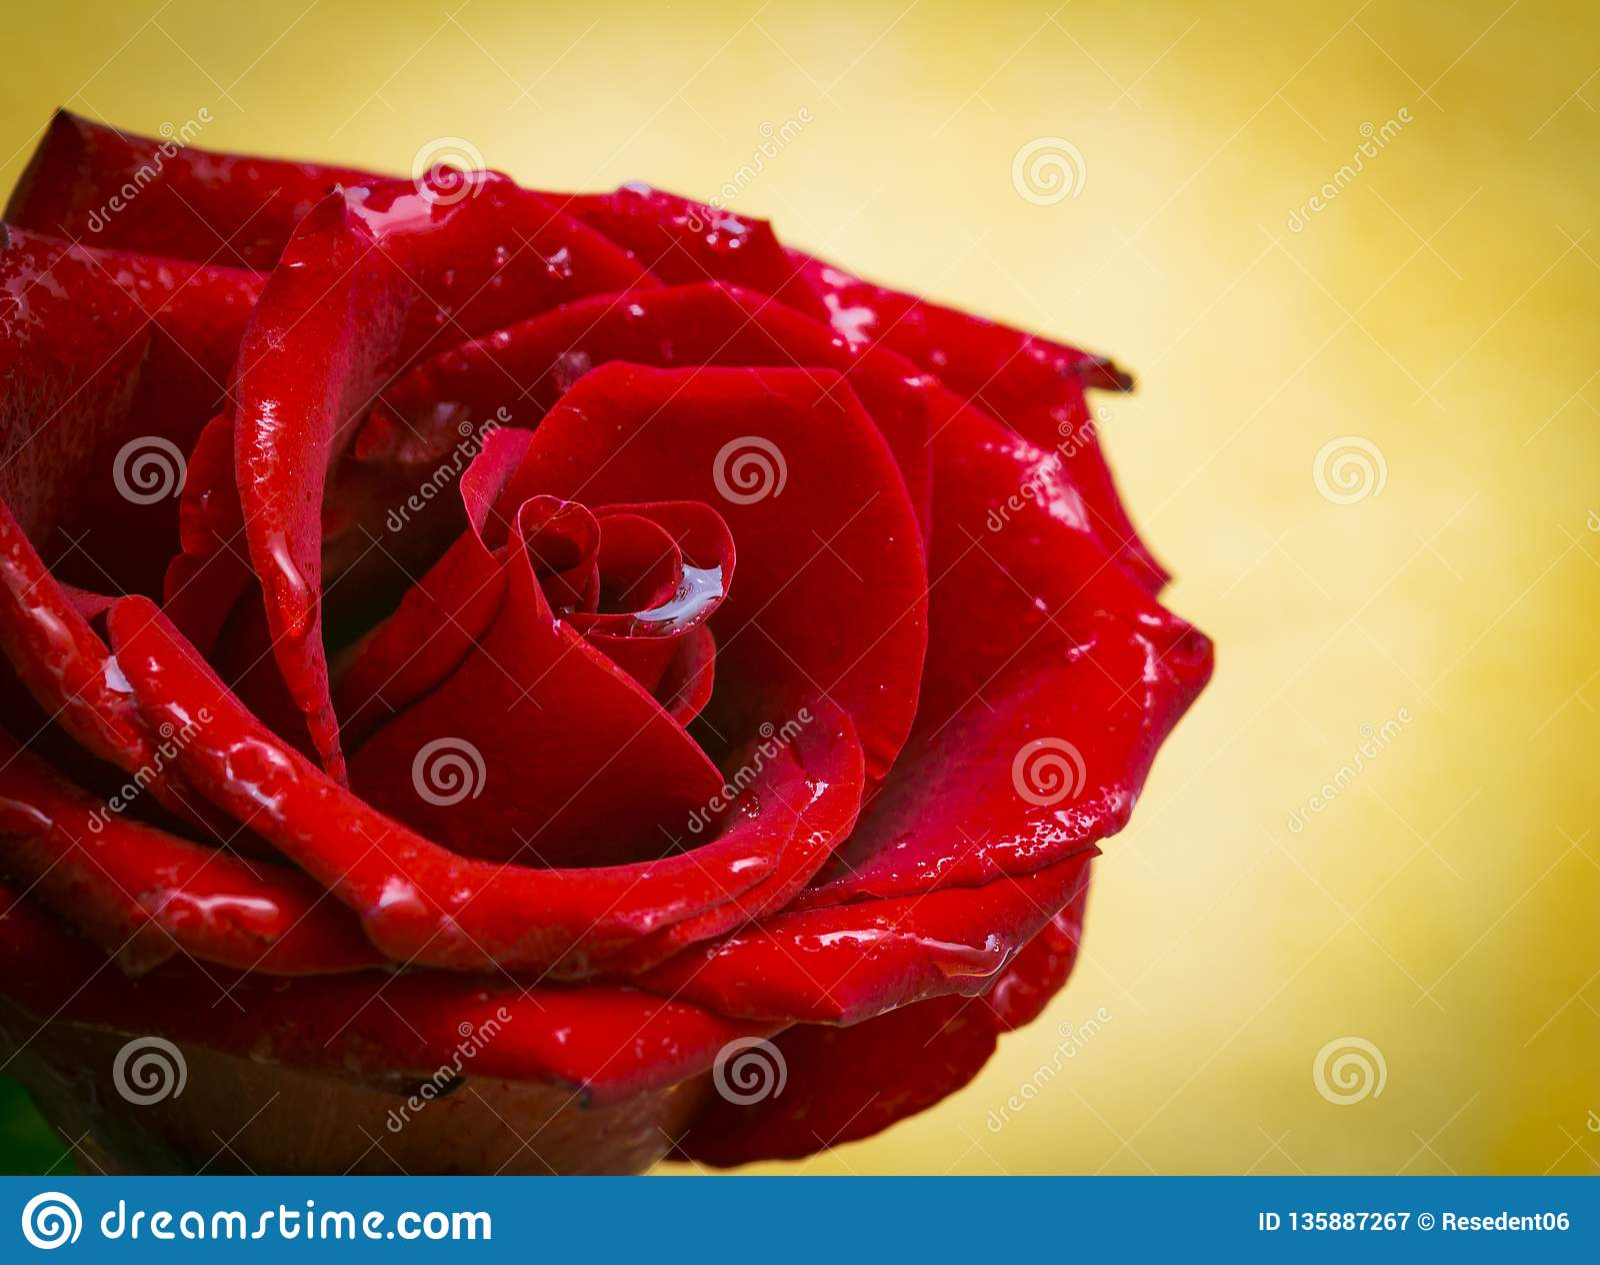 красивая красная роза в пузырях